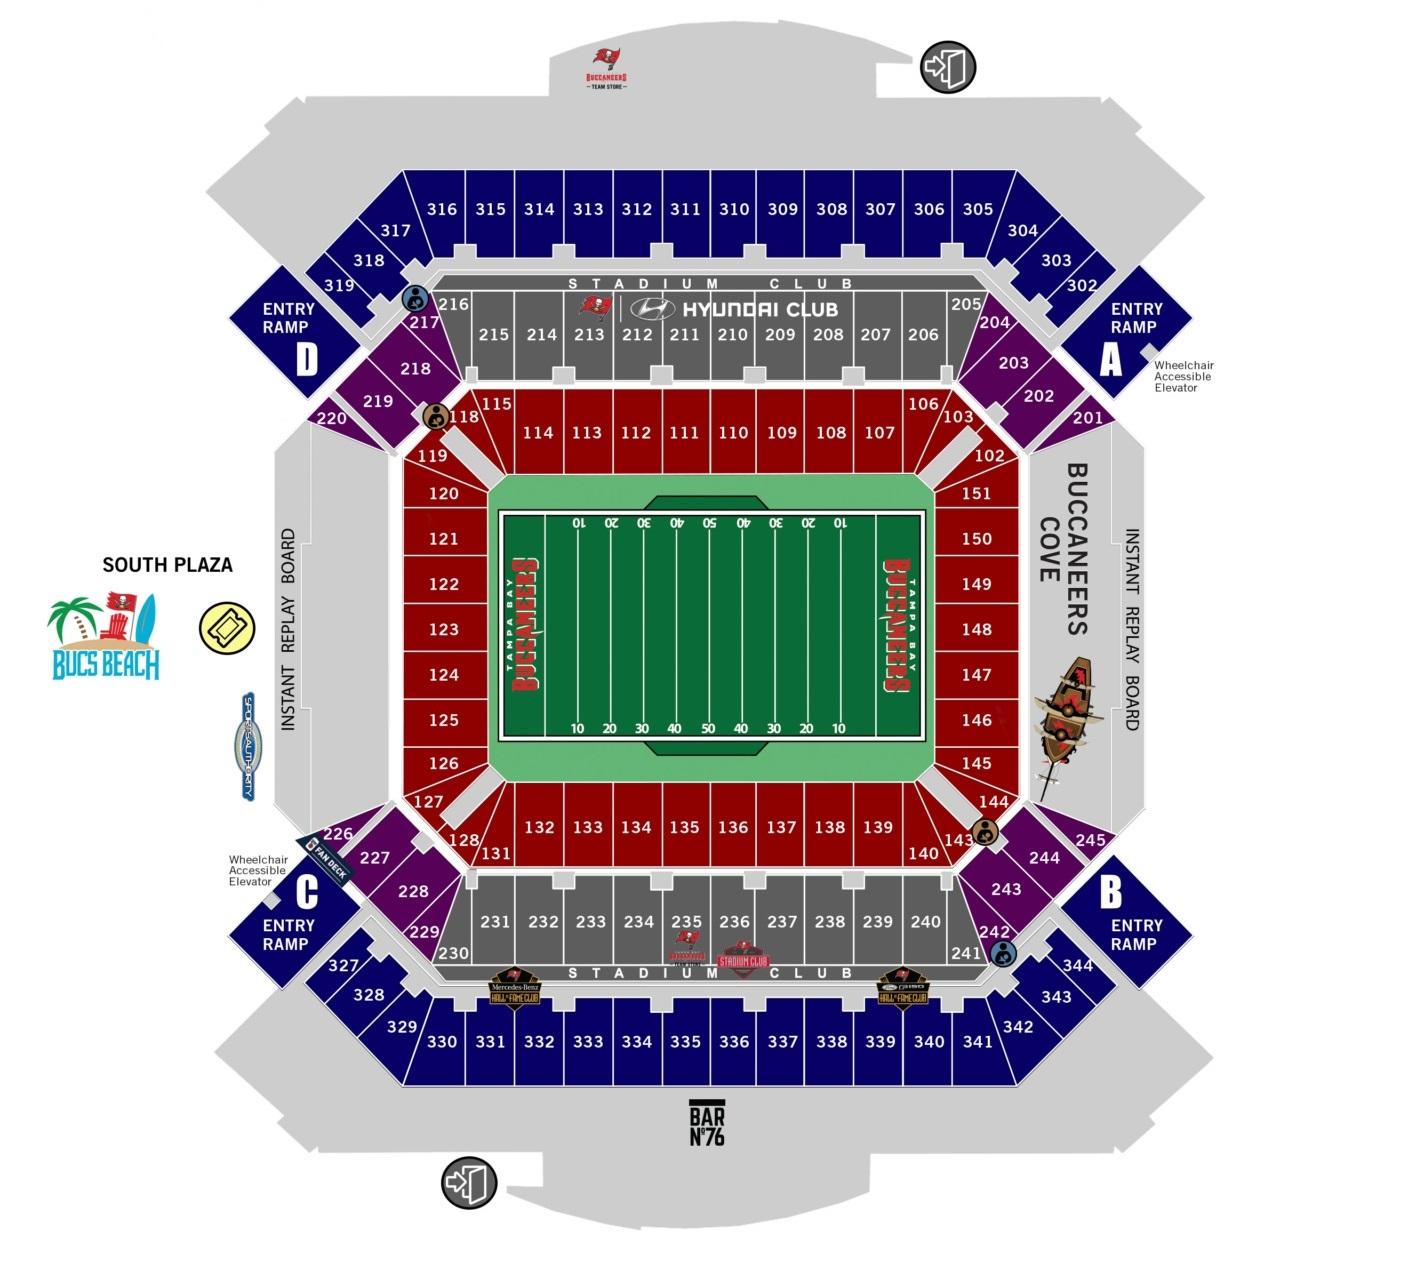 Super Bowl LV - Raymond James Stadium Seating Chart